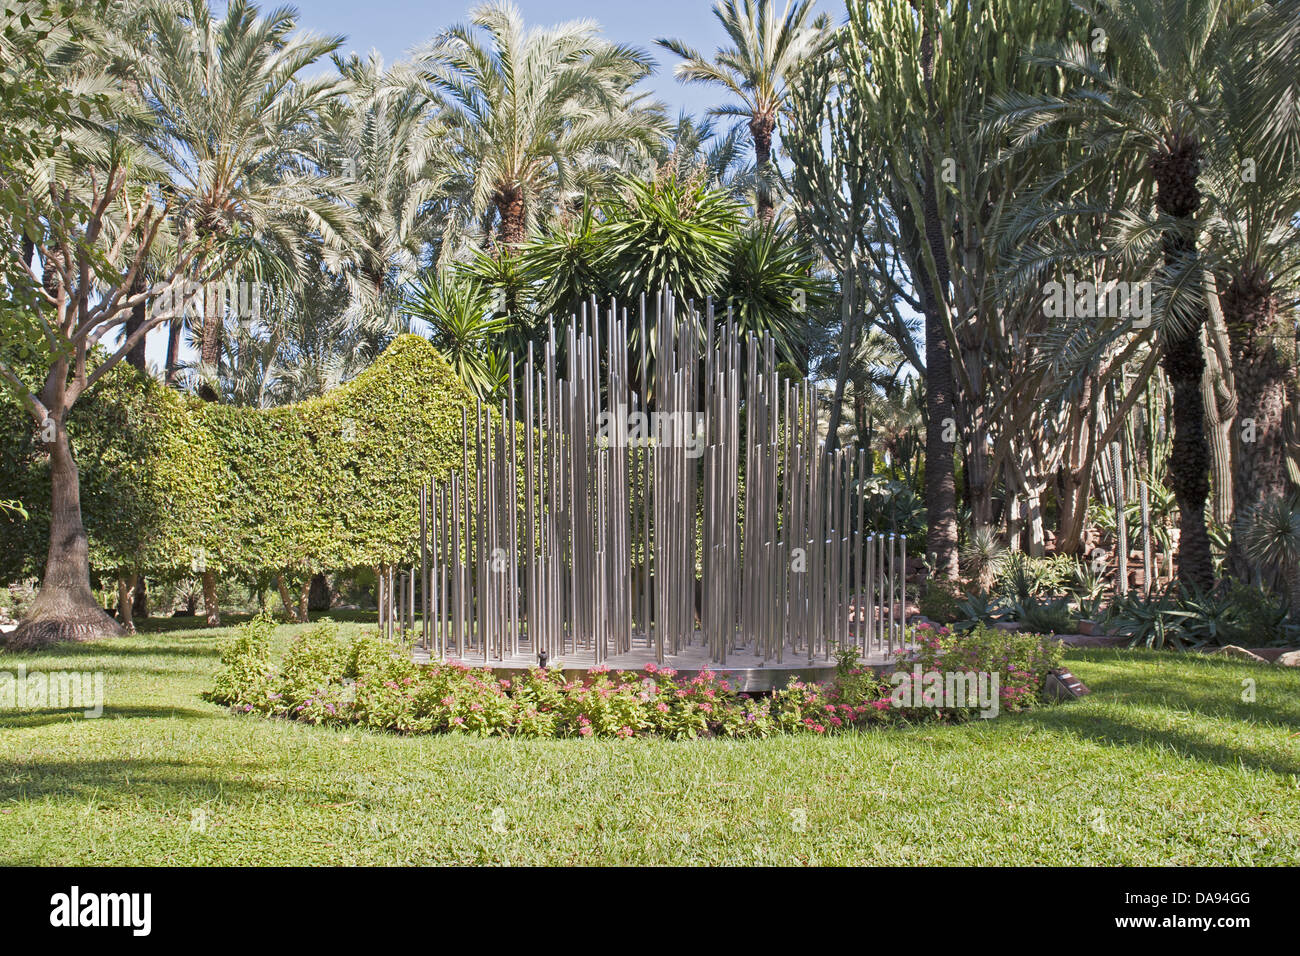 Exceptional Europa, Spanien, Valencia, Elche, Carrer Porta De La Morera, Palmen, Garten,  Palmen, Stahl, Stück Kunst, Tourismus, Pflanzen, Gärten, Pa